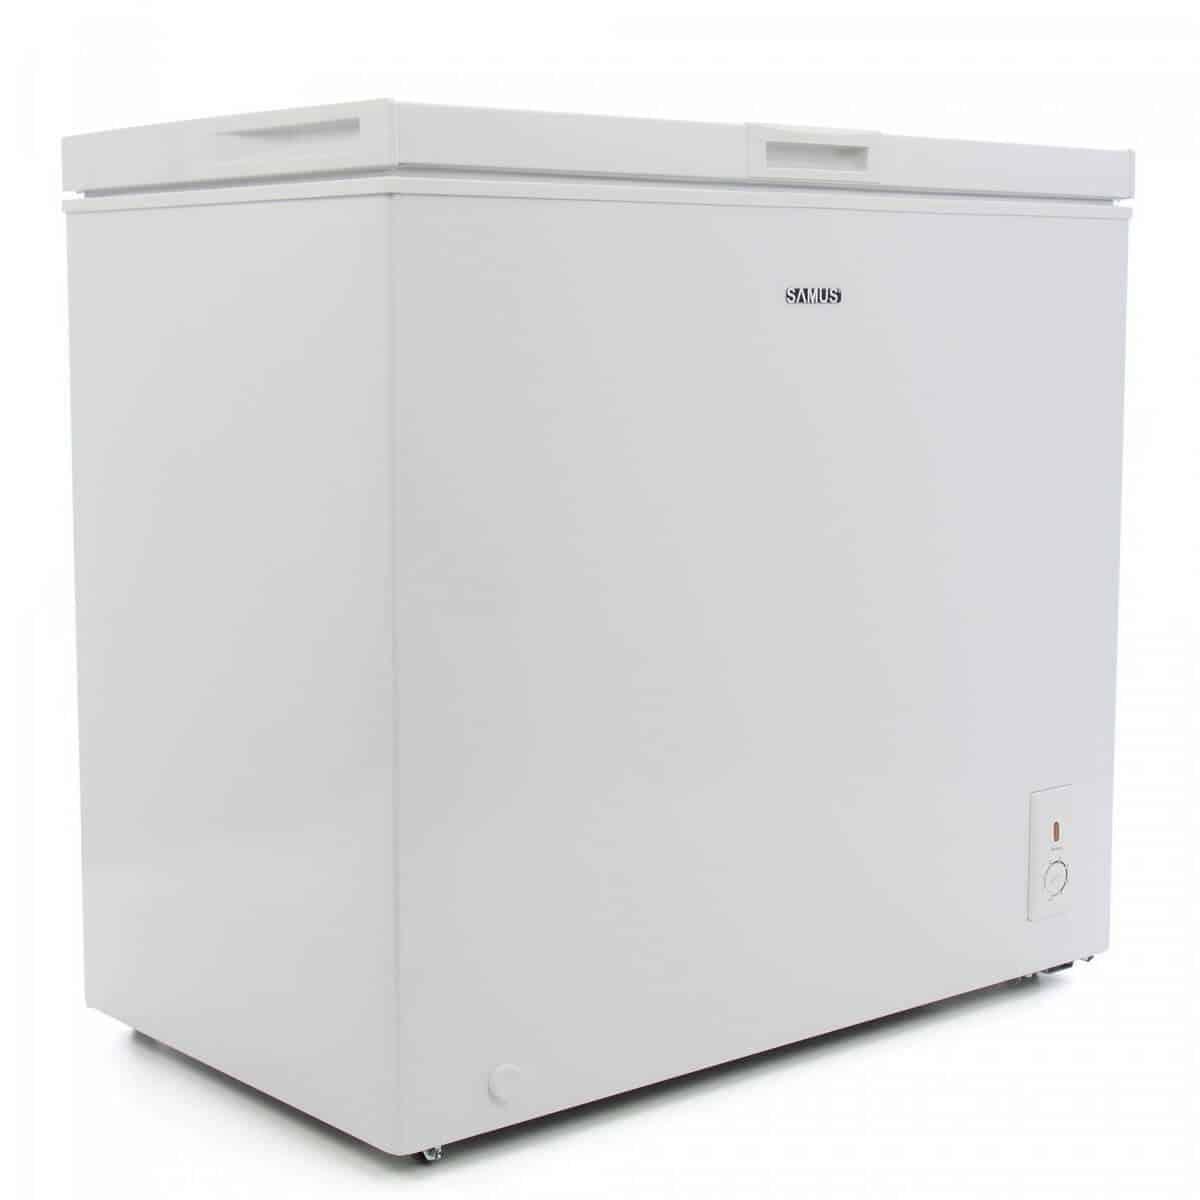 Lada frigorifica Samus LS220A+, Clasa A+, 200 litri, Alb